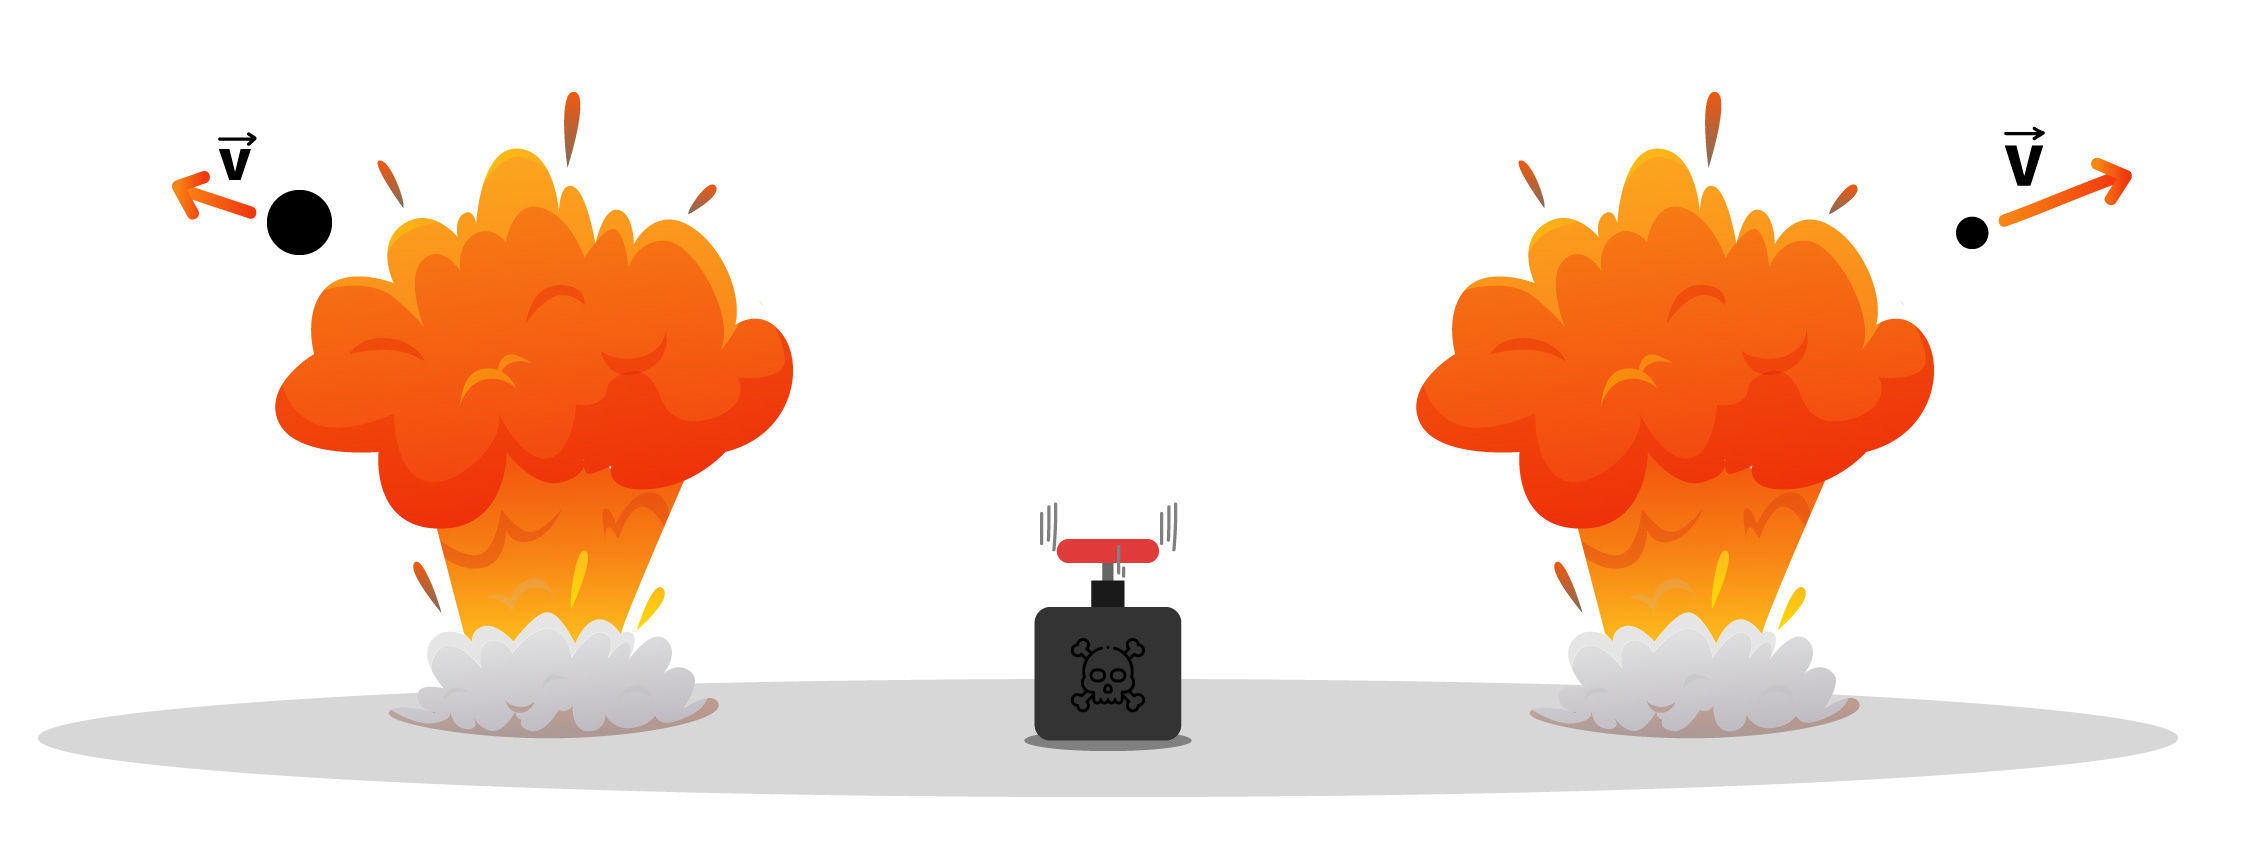 Bomba explode e atira duas bolas para os lados - Segunda Lei de Newton.